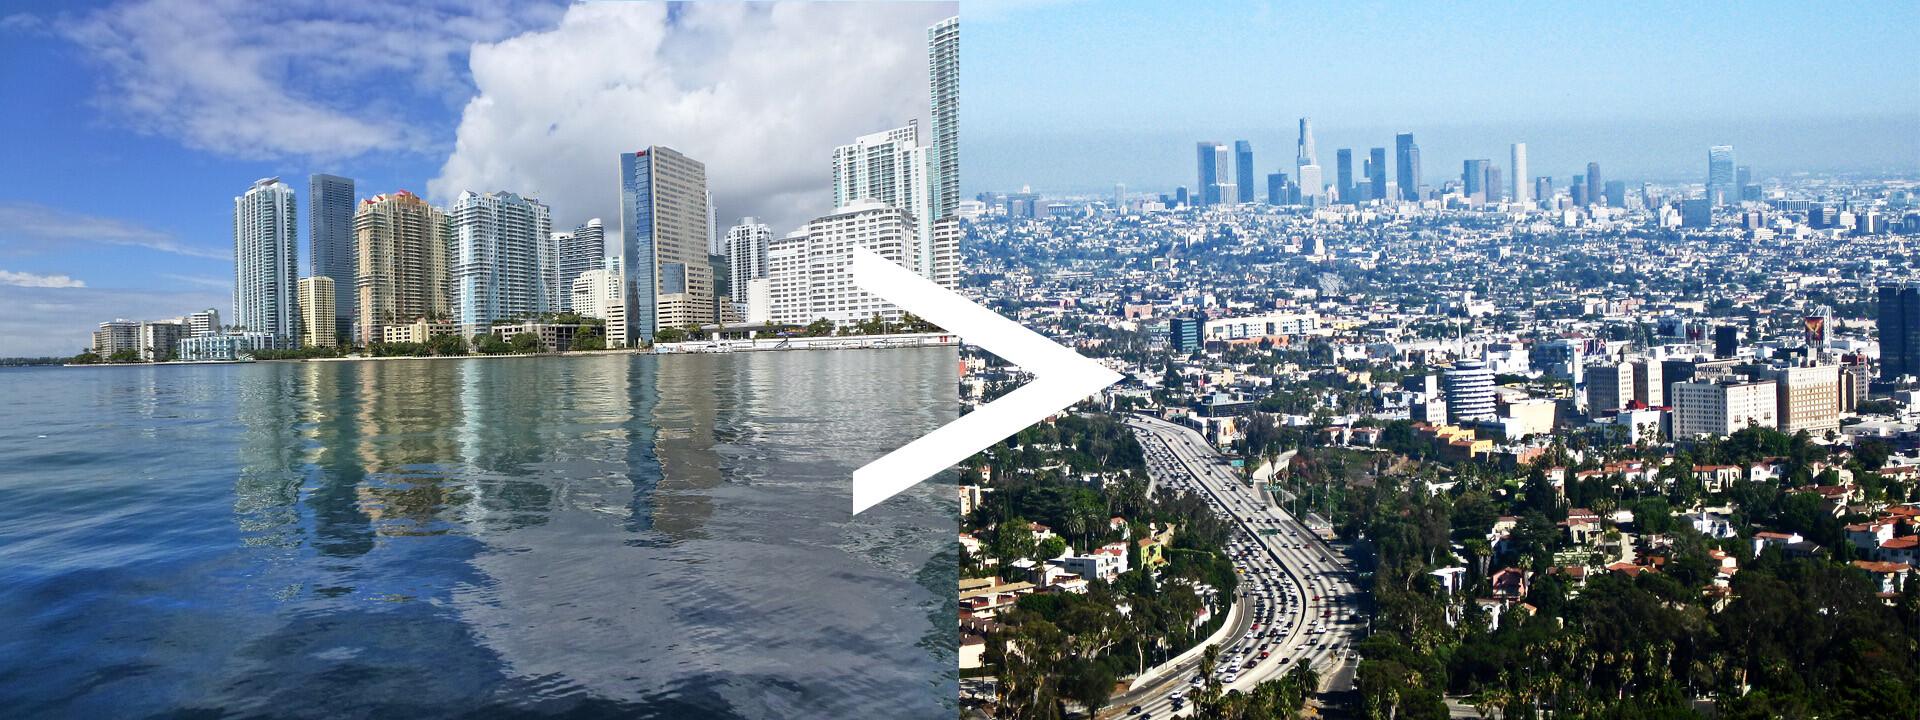 Auto Transport Los Angeles to Miami Route